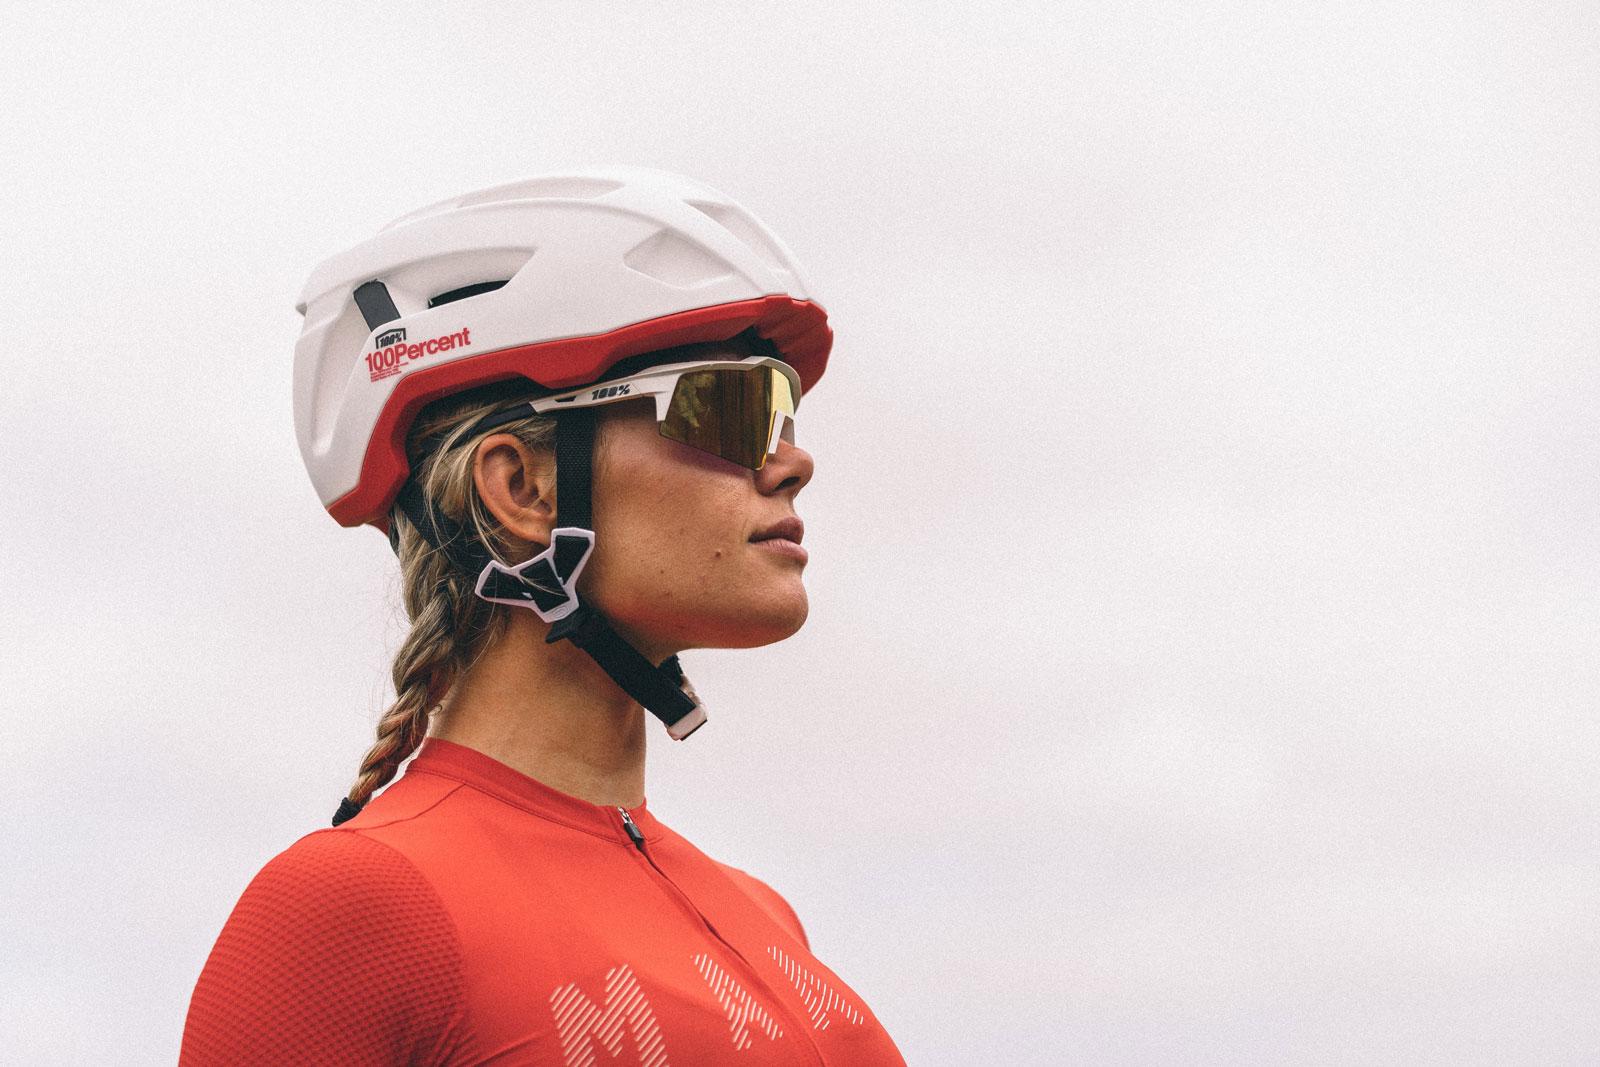 100% altis gravel helmet good coverage